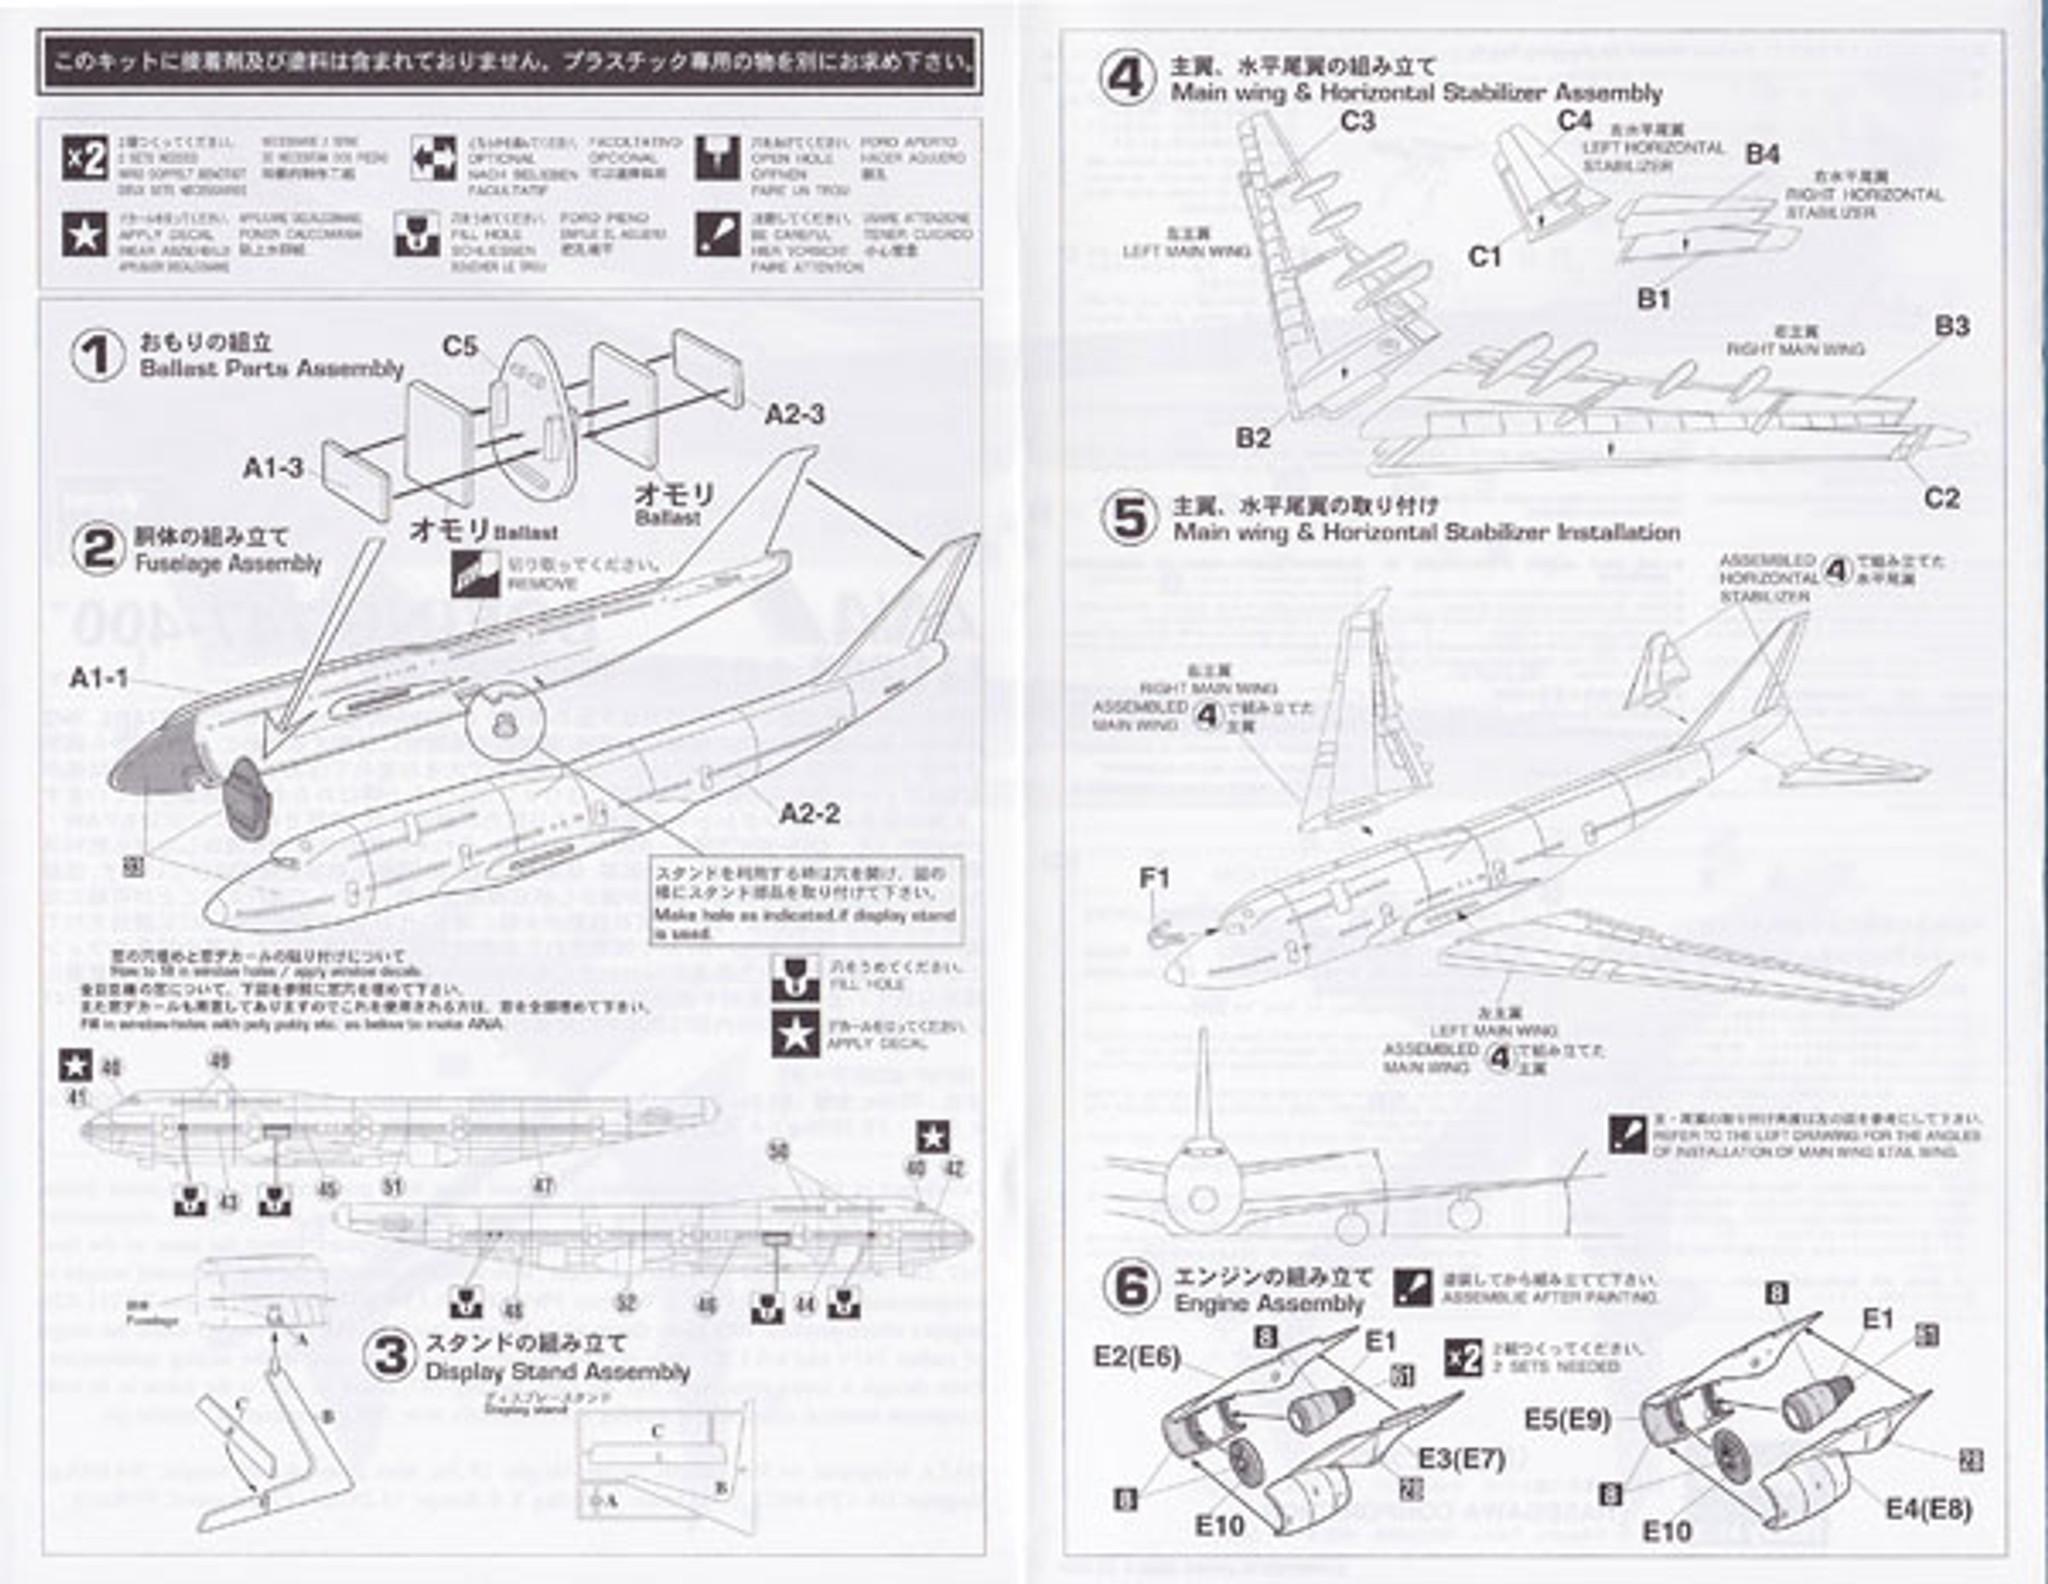 Hasegawa 02 ANA All Nippon Airways Boeing 747-400 1/200